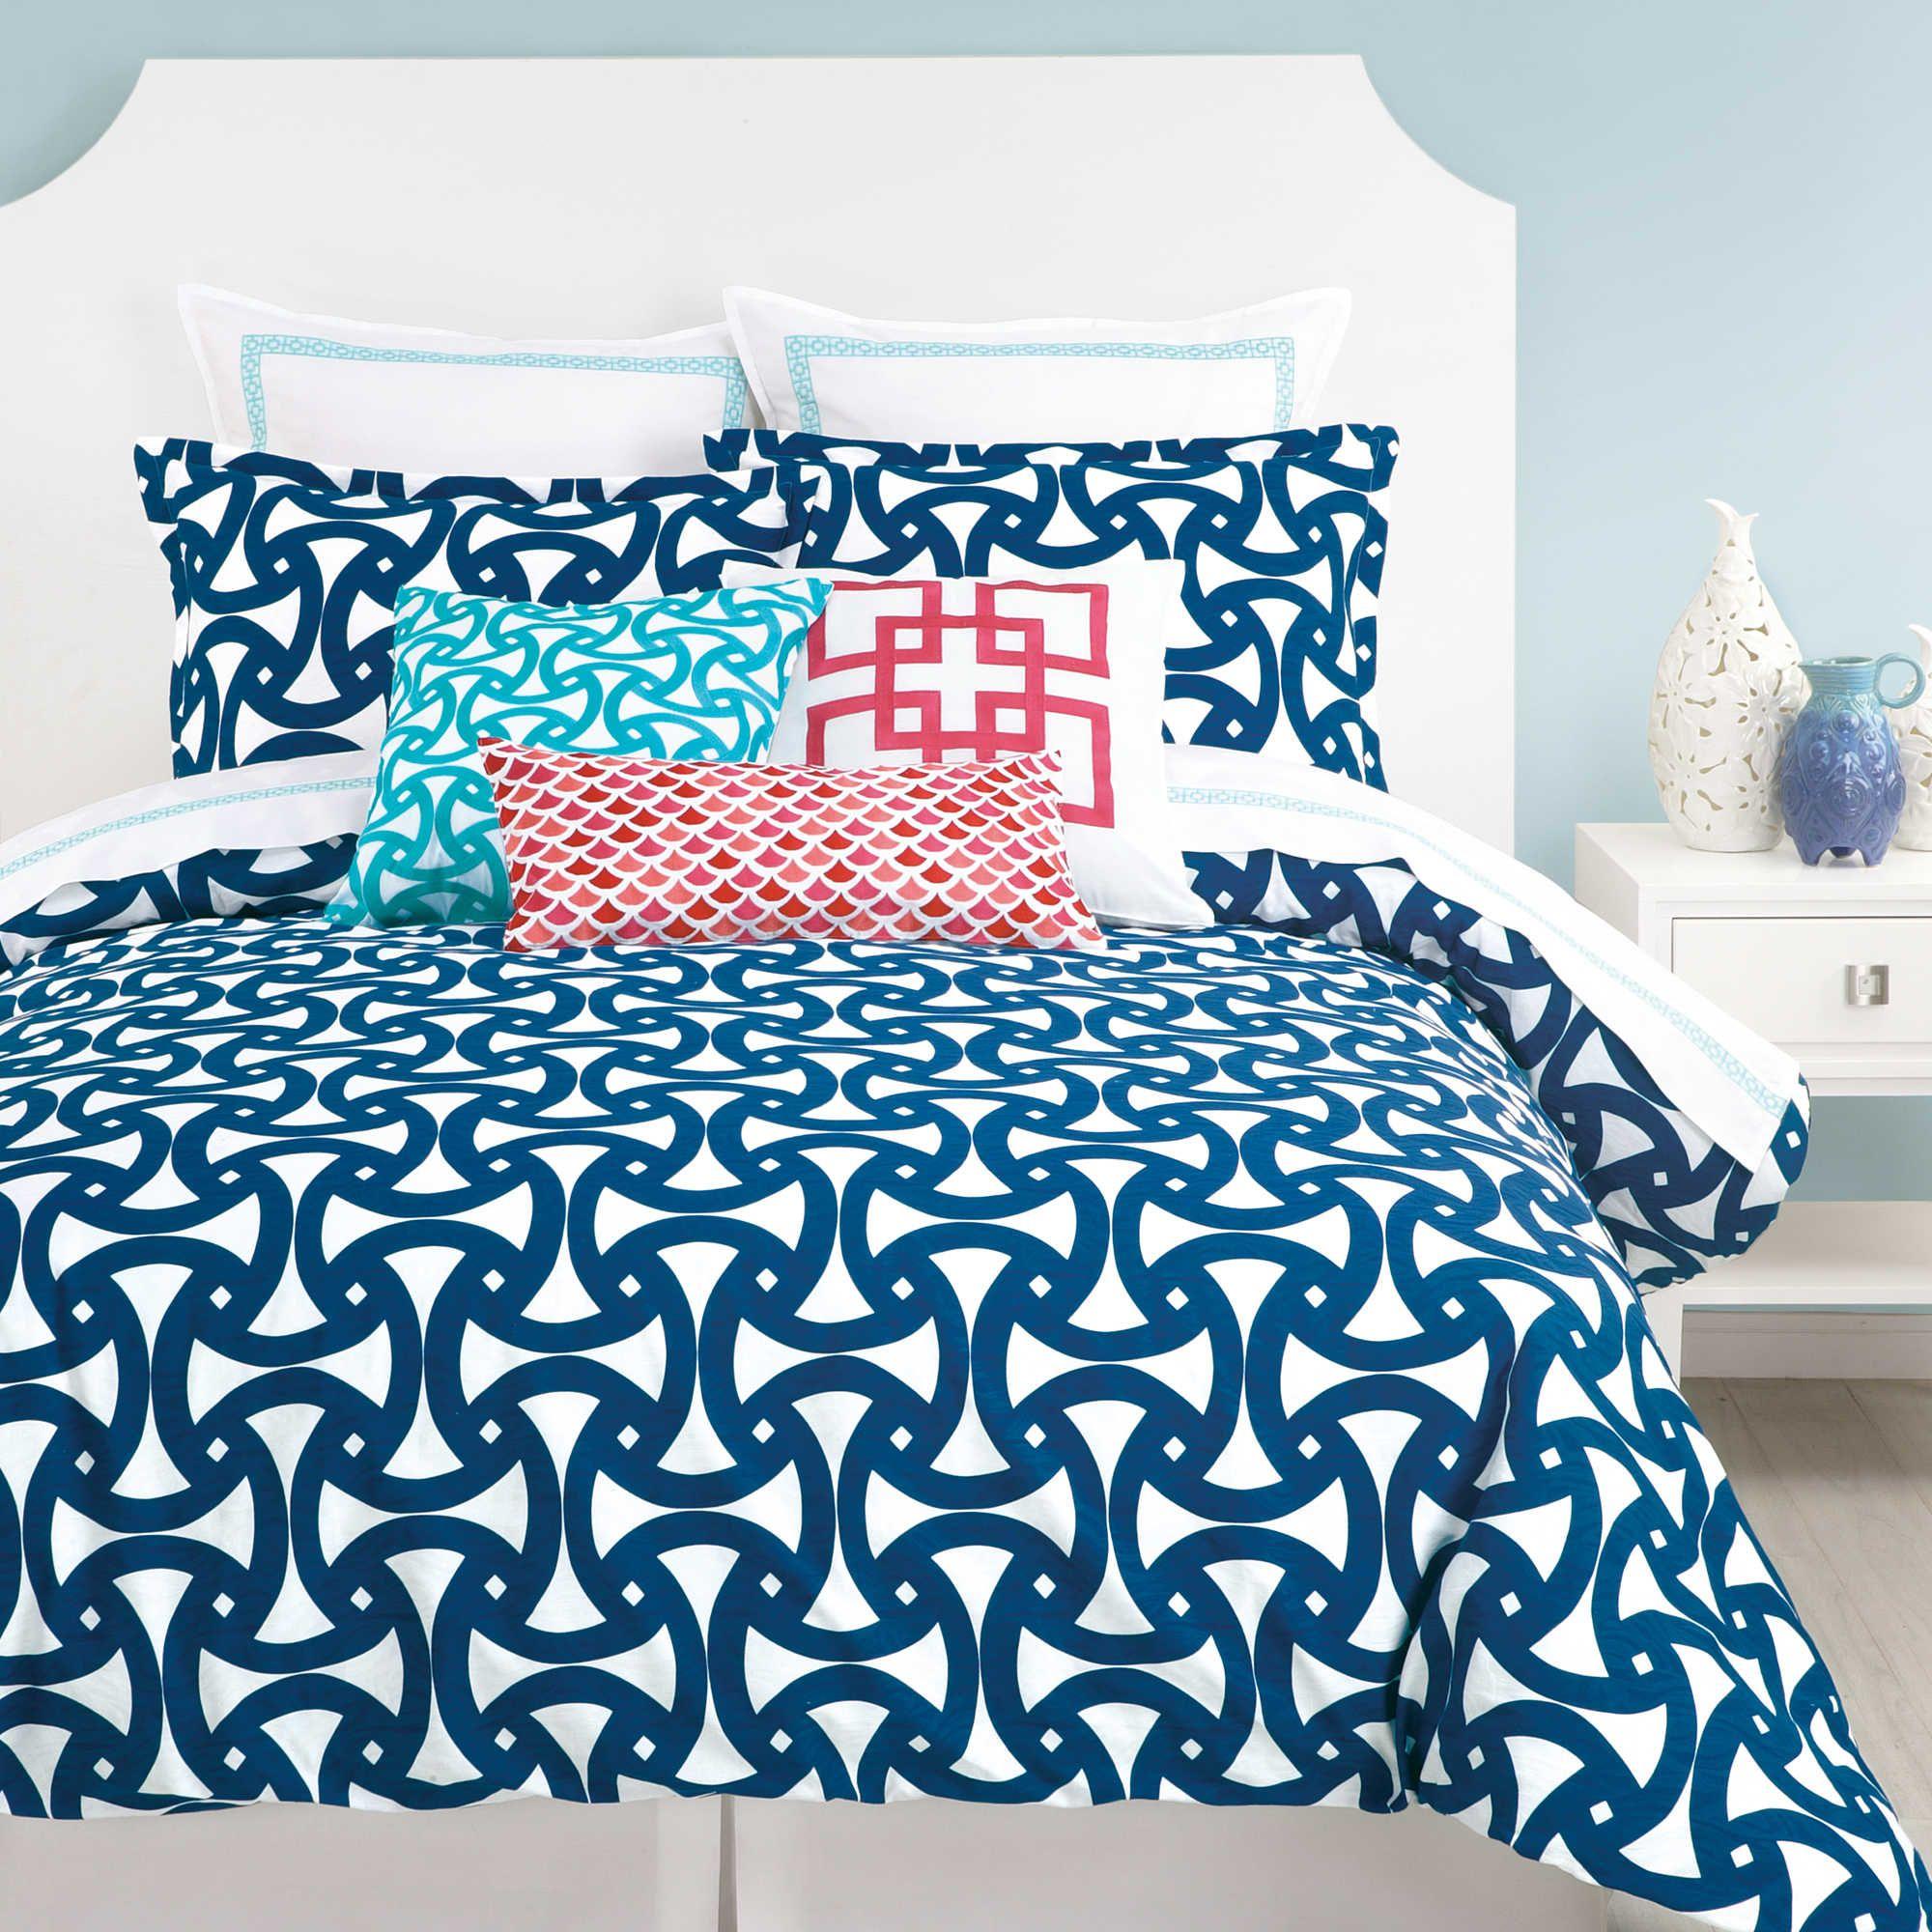 Trina Turk Santorini Duvet Cover Set With Images Comforter